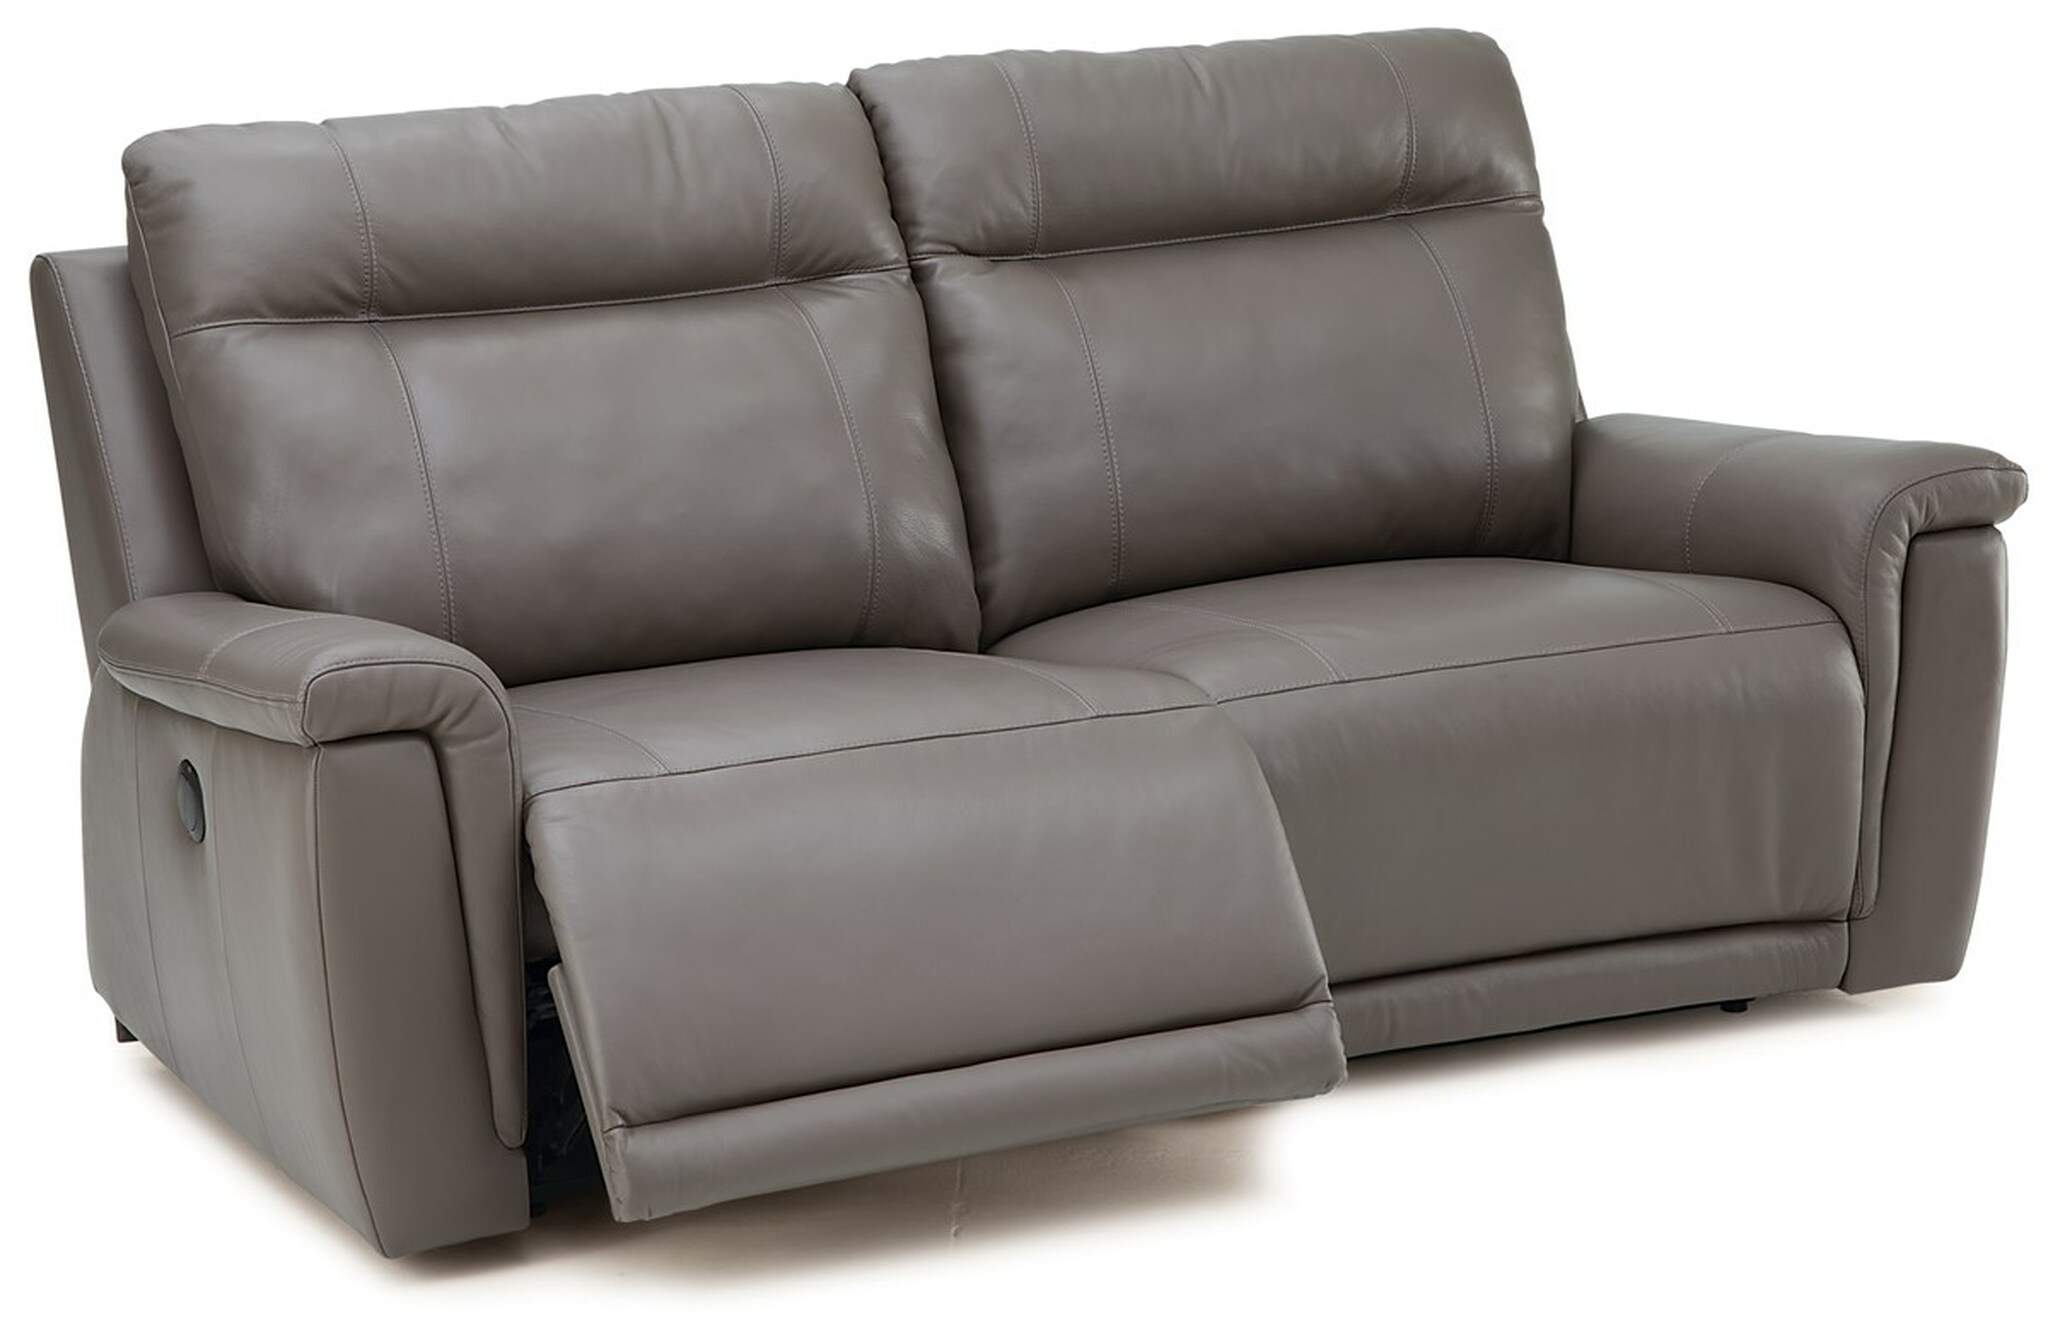 Superieur Palliser 41121 Westpoint Sofa Recliner ...